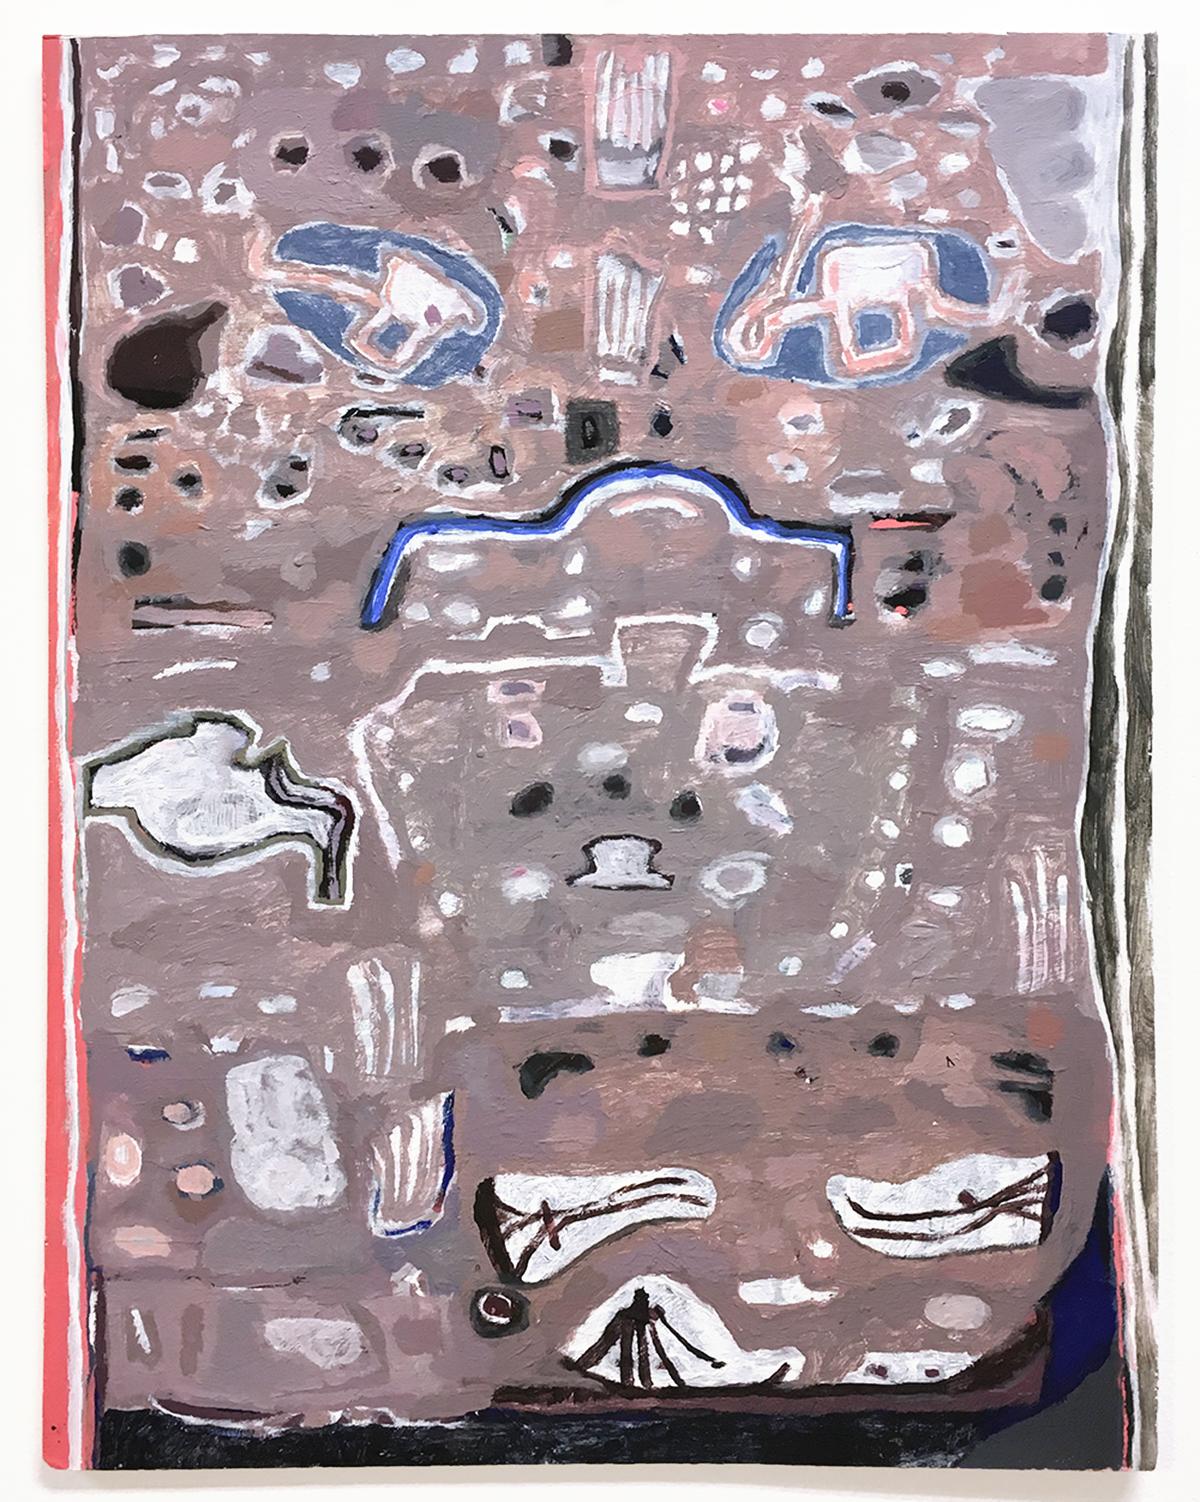 paul's painting iphone.jpg